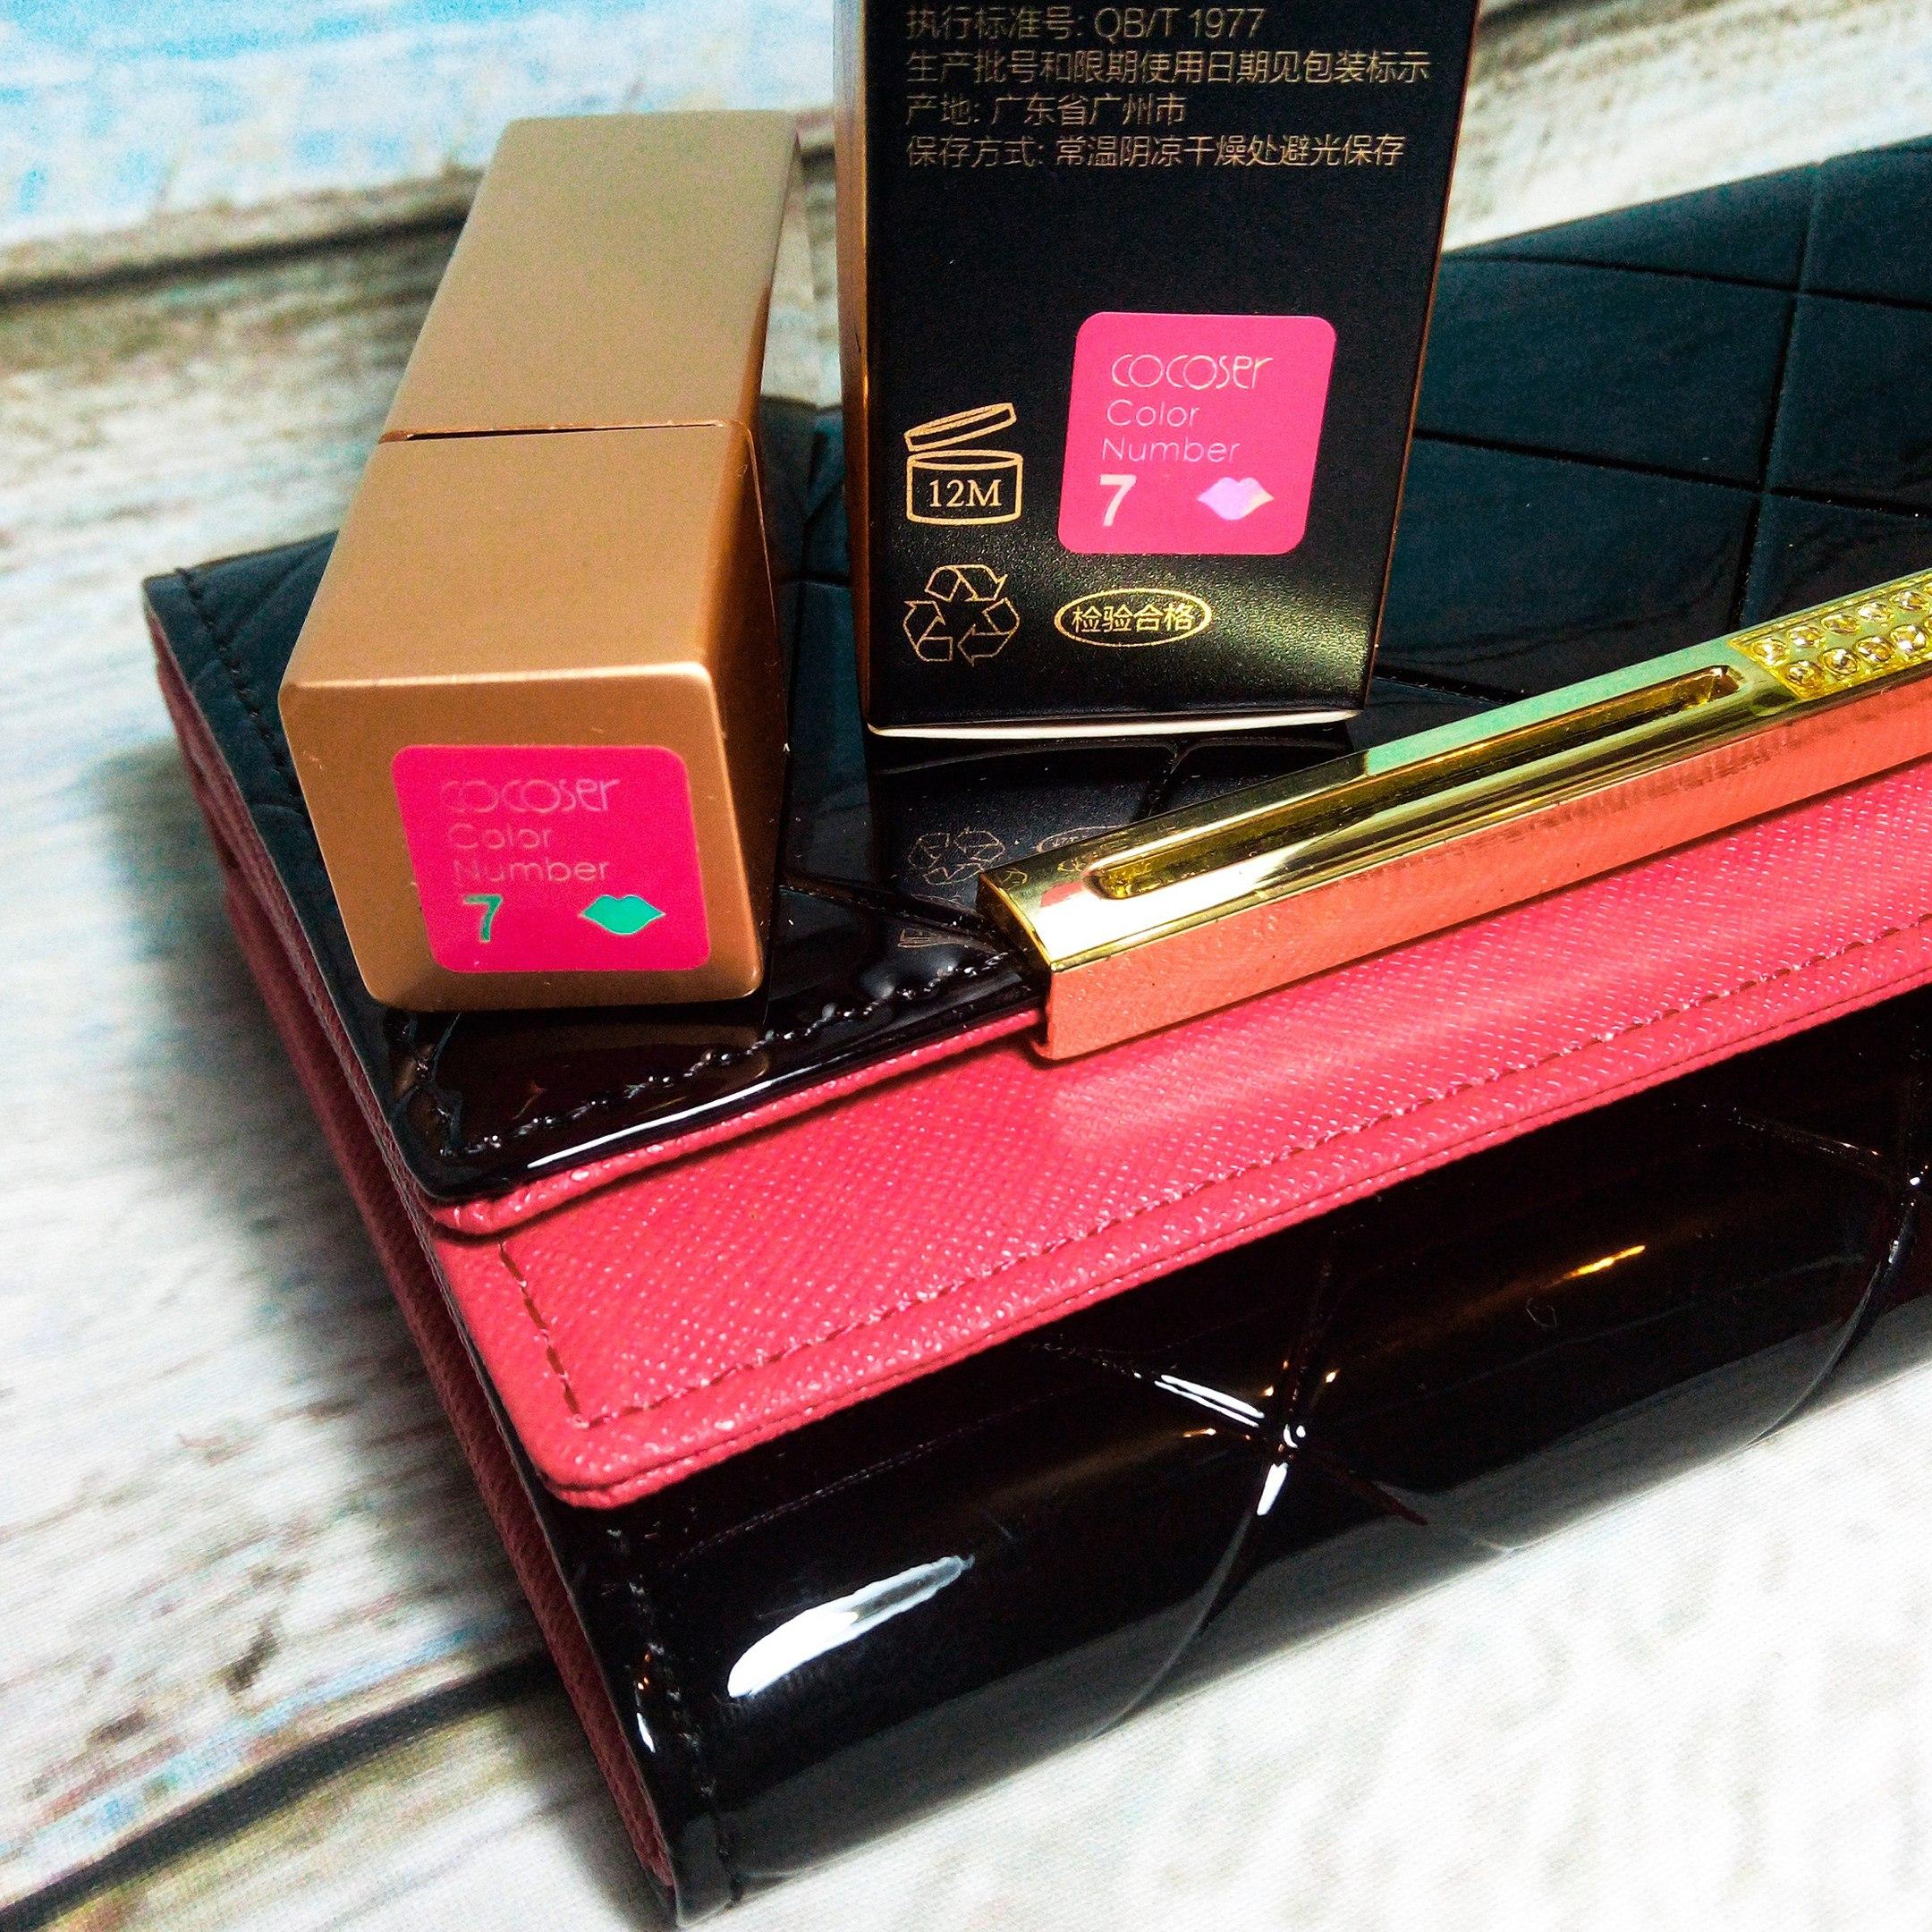 Обзор на матовую губную помаду из магазина Loumeis make up Co Ltd